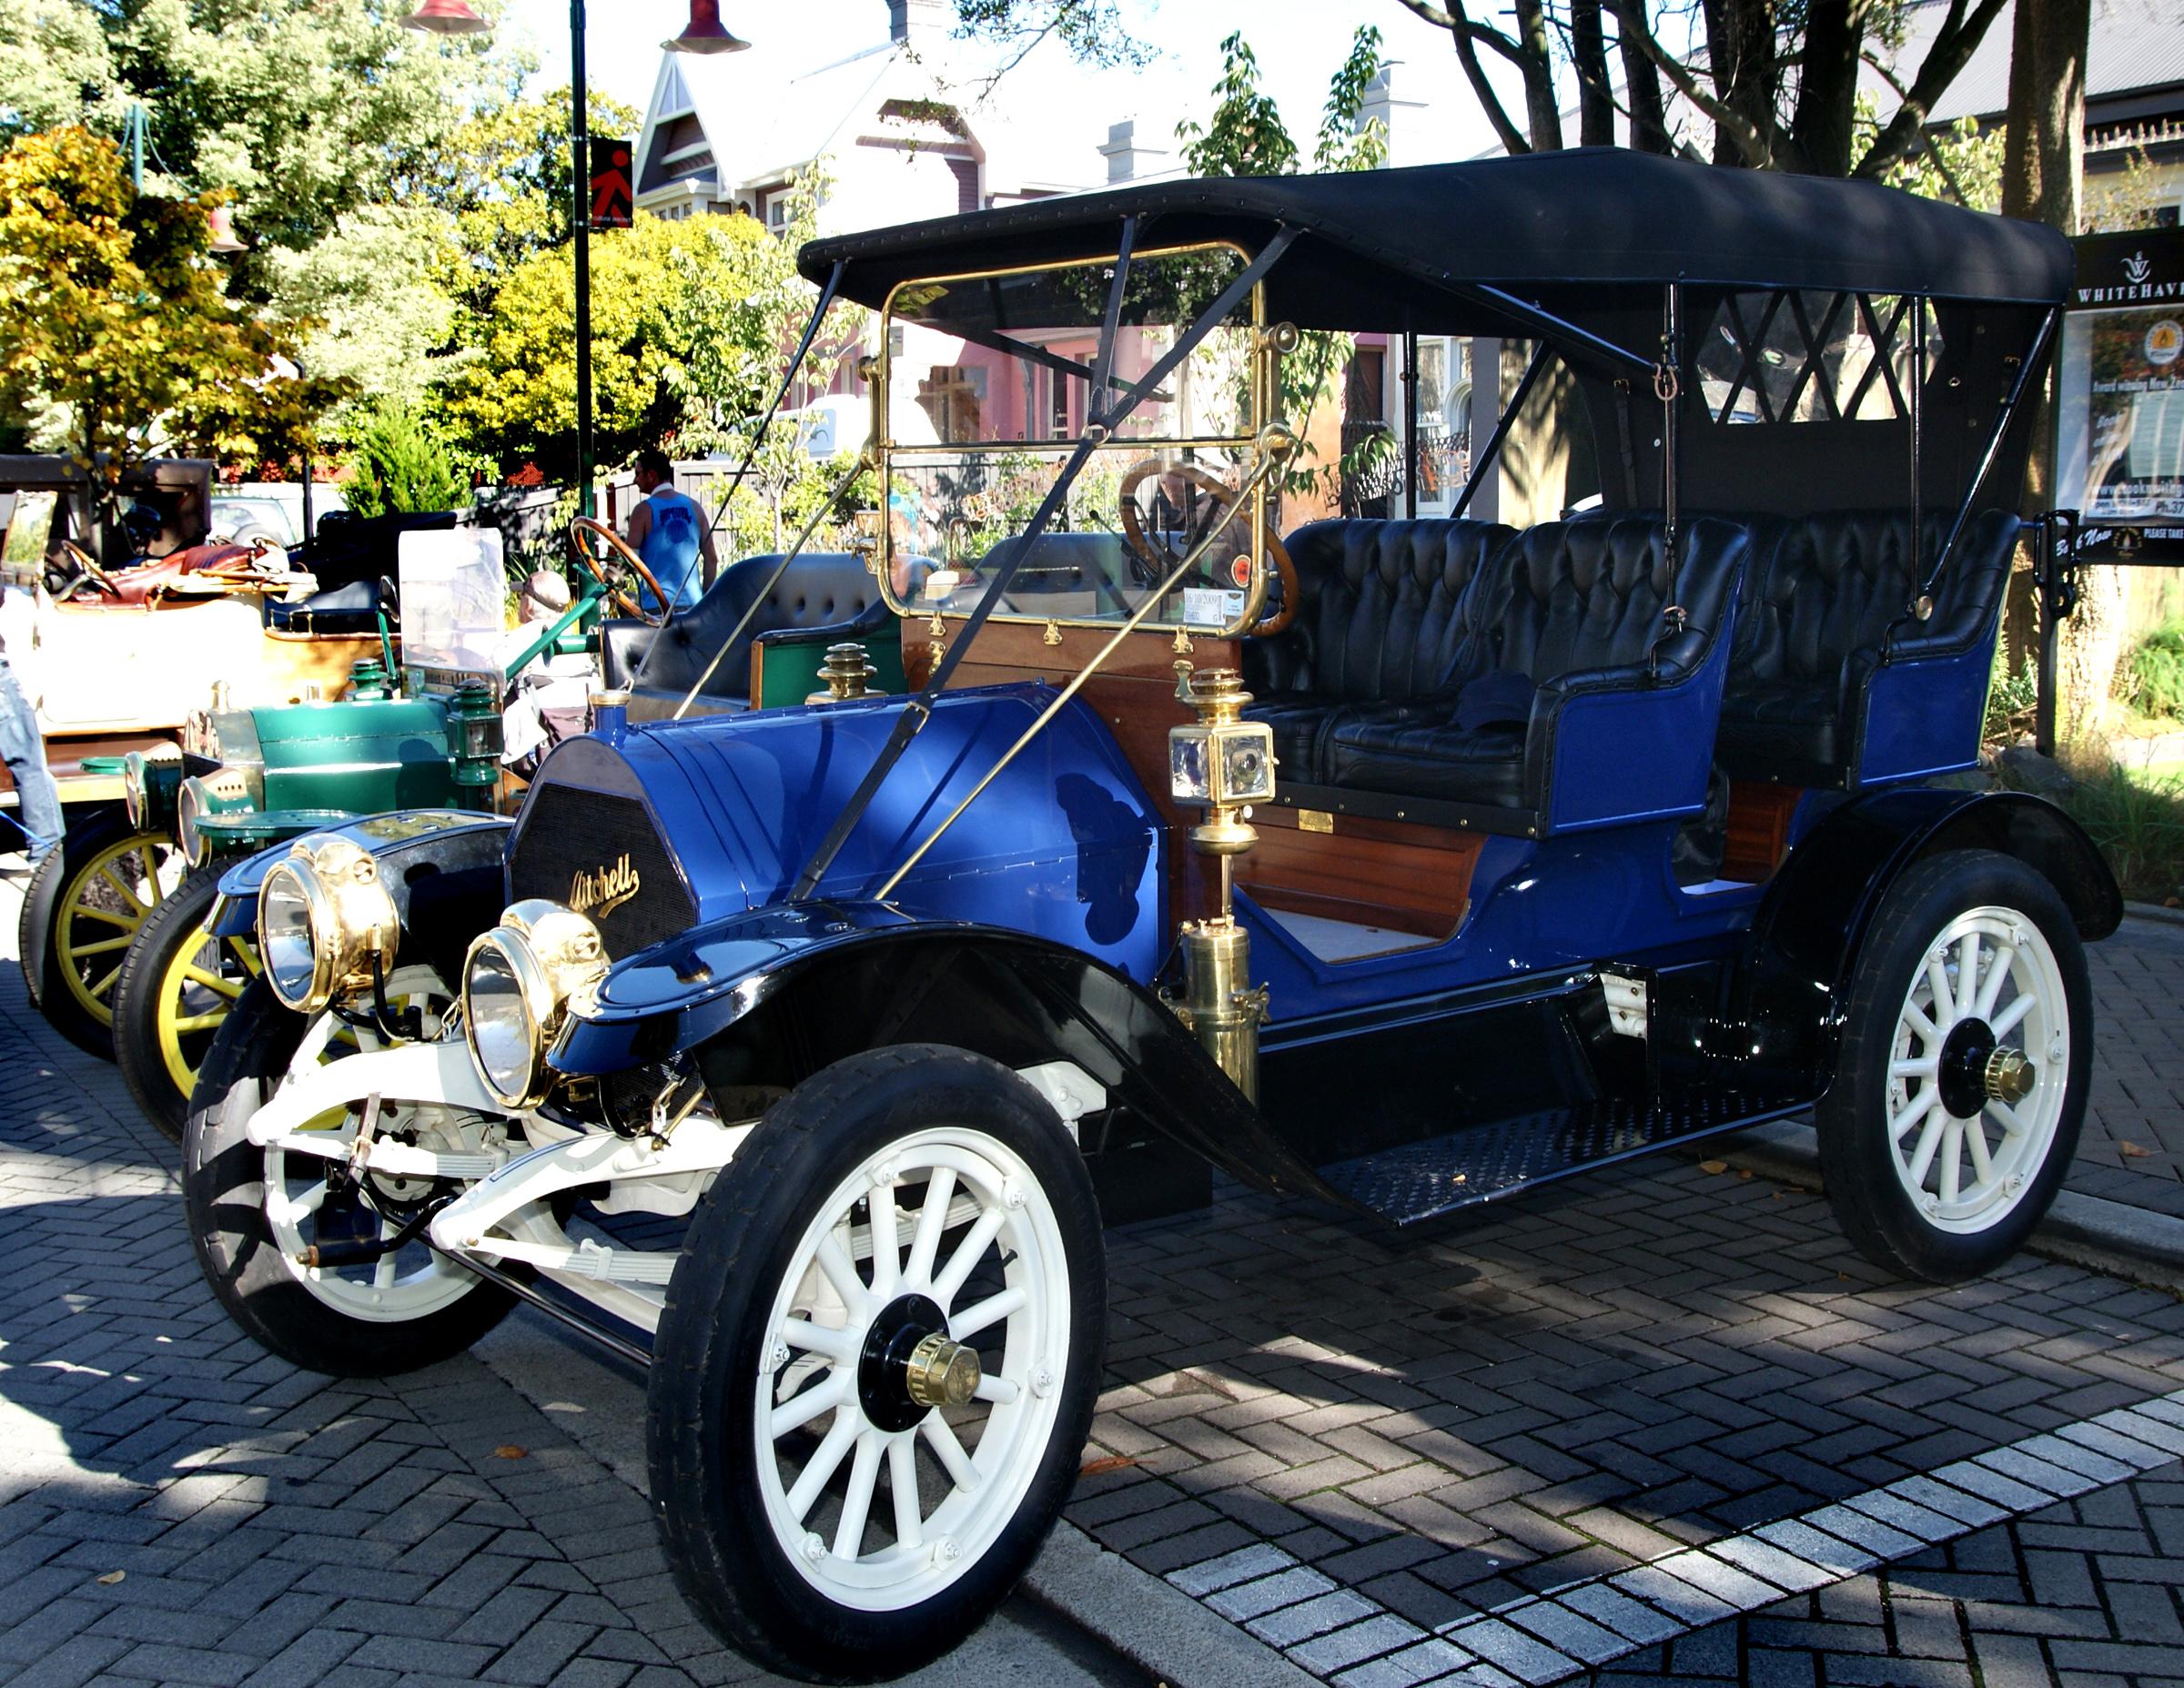 kostenlose foto dreirad fahrzeug kraftfahrzeug oldtimer alte autos blaues auto carshows. Black Bedroom Furniture Sets. Home Design Ideas